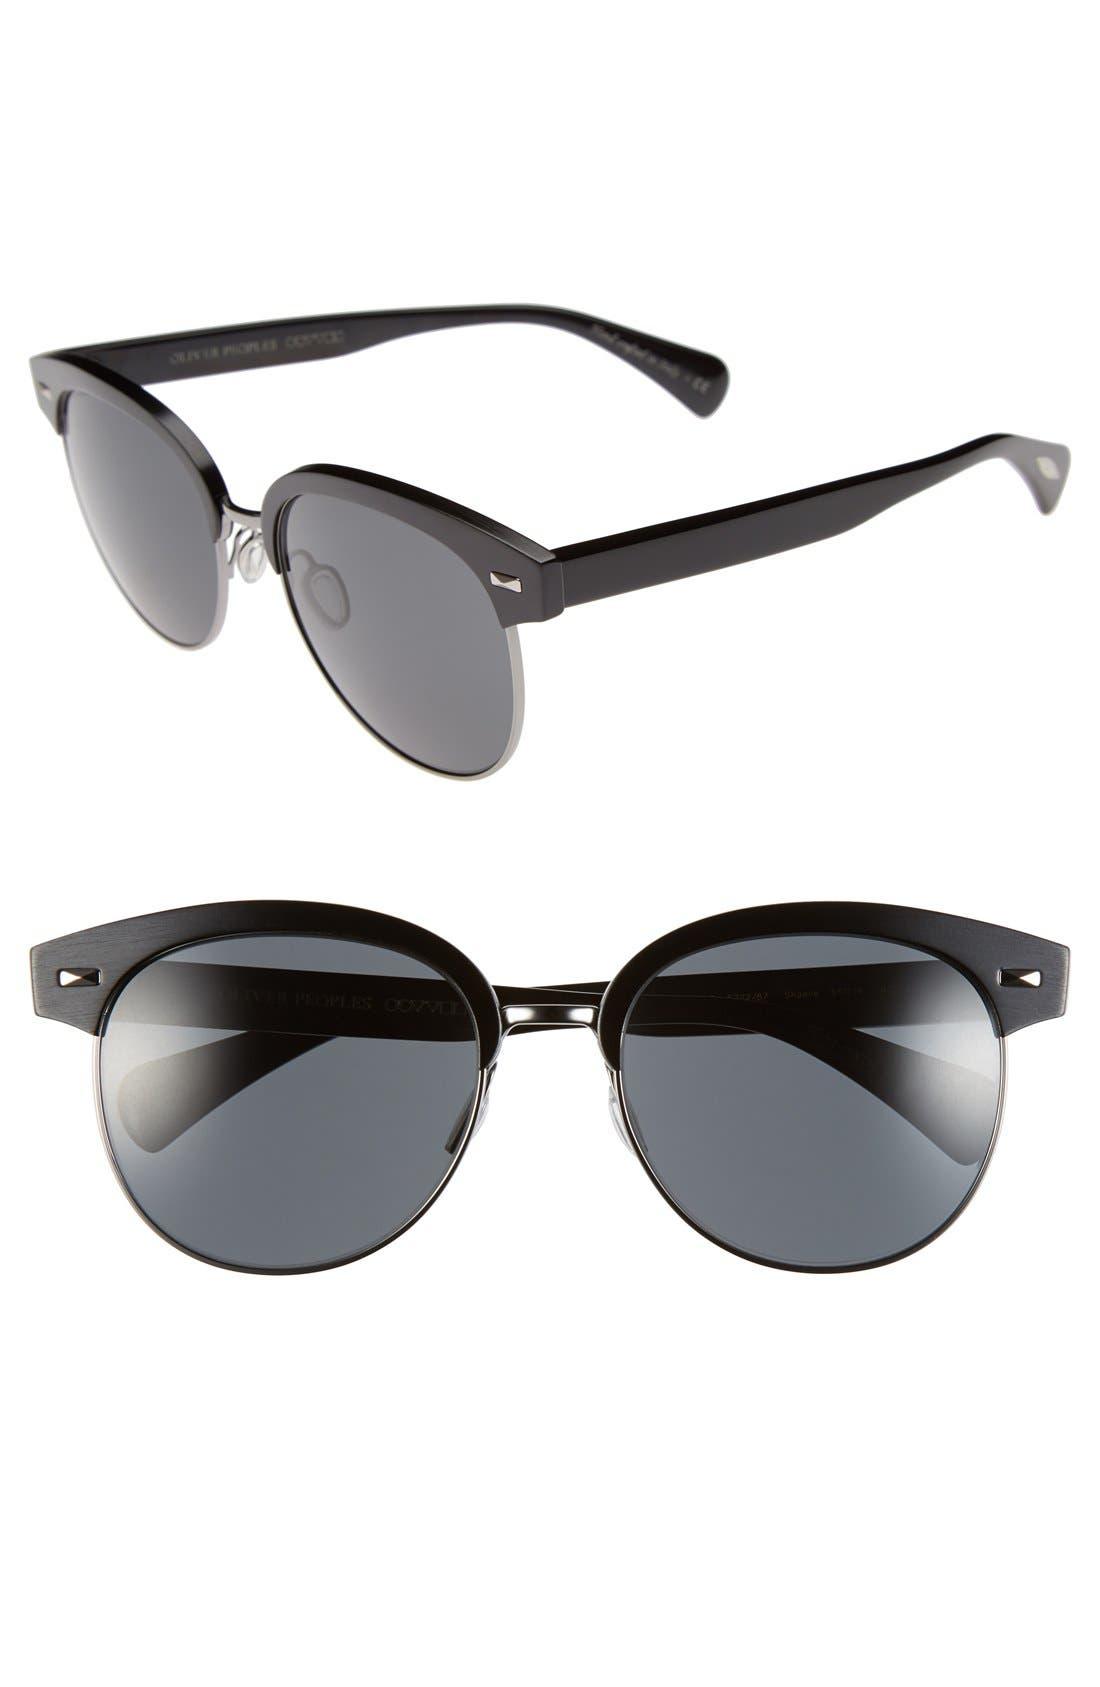 Alternate Image 1 Selected - Oliver Peoples 'Shaelie' 55mm Sunglasses